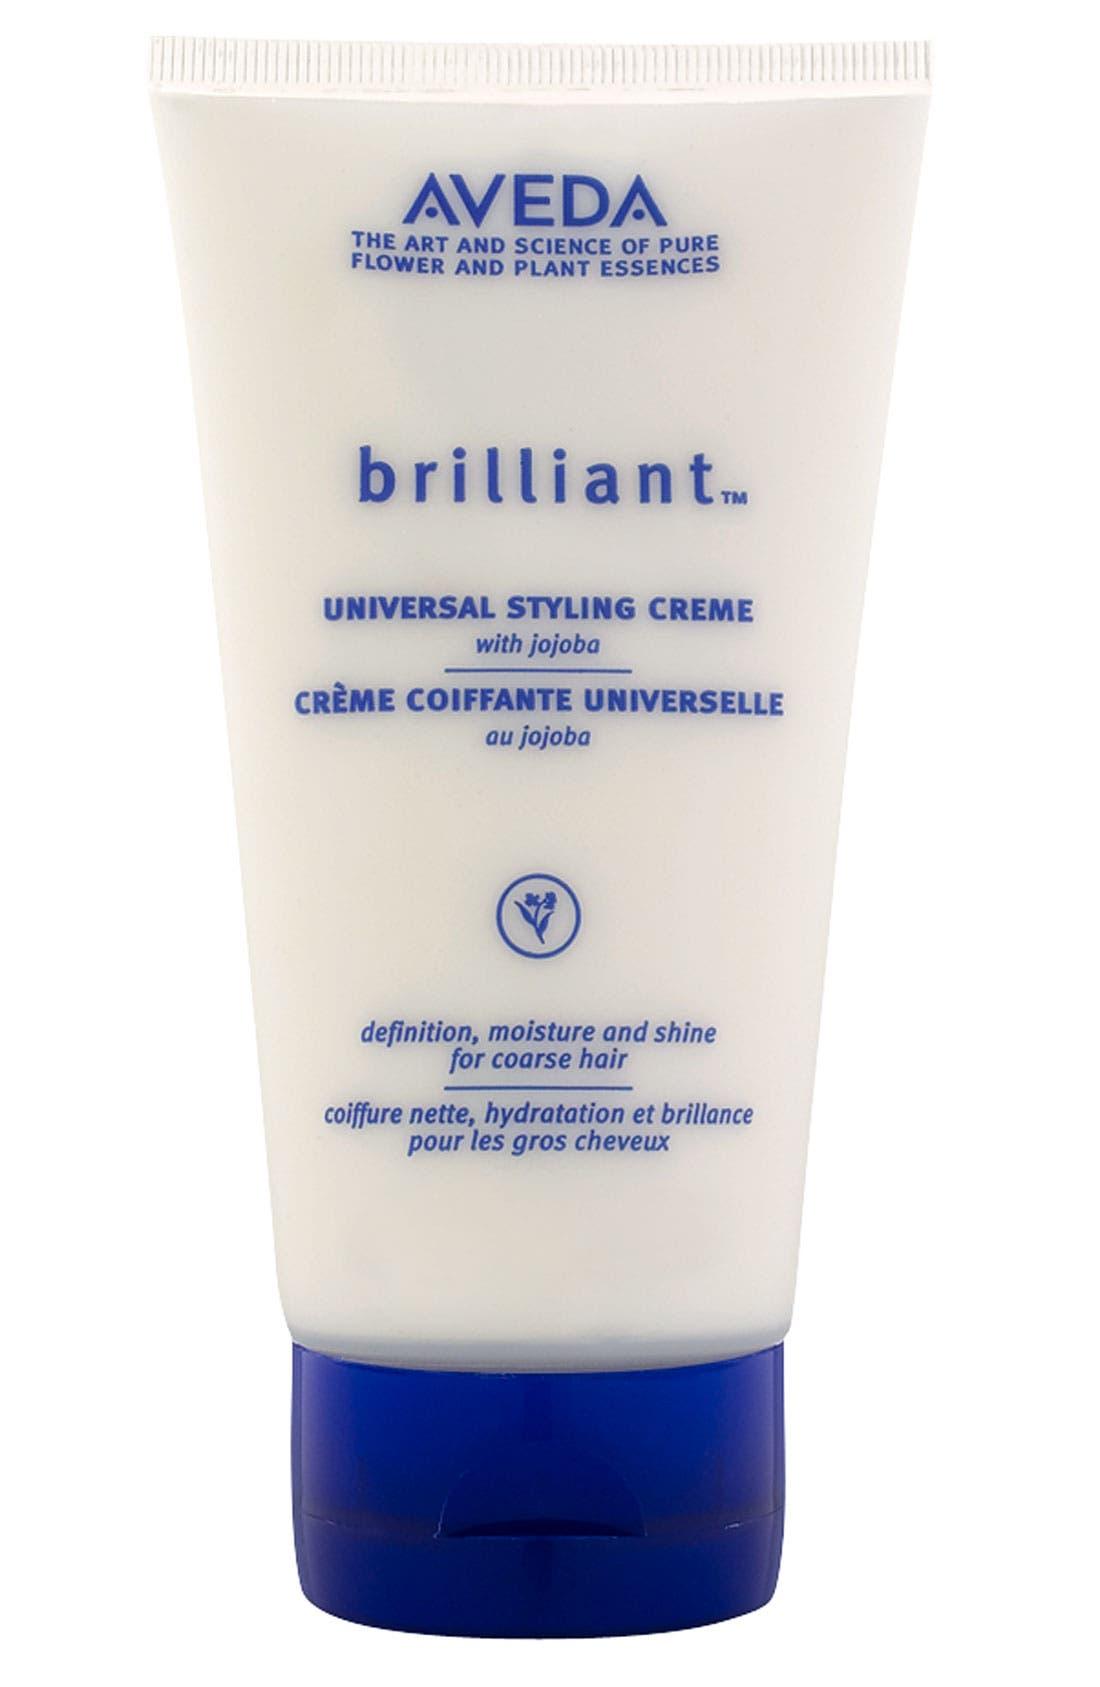 Aveda brilliant™ Universal Styling Cream